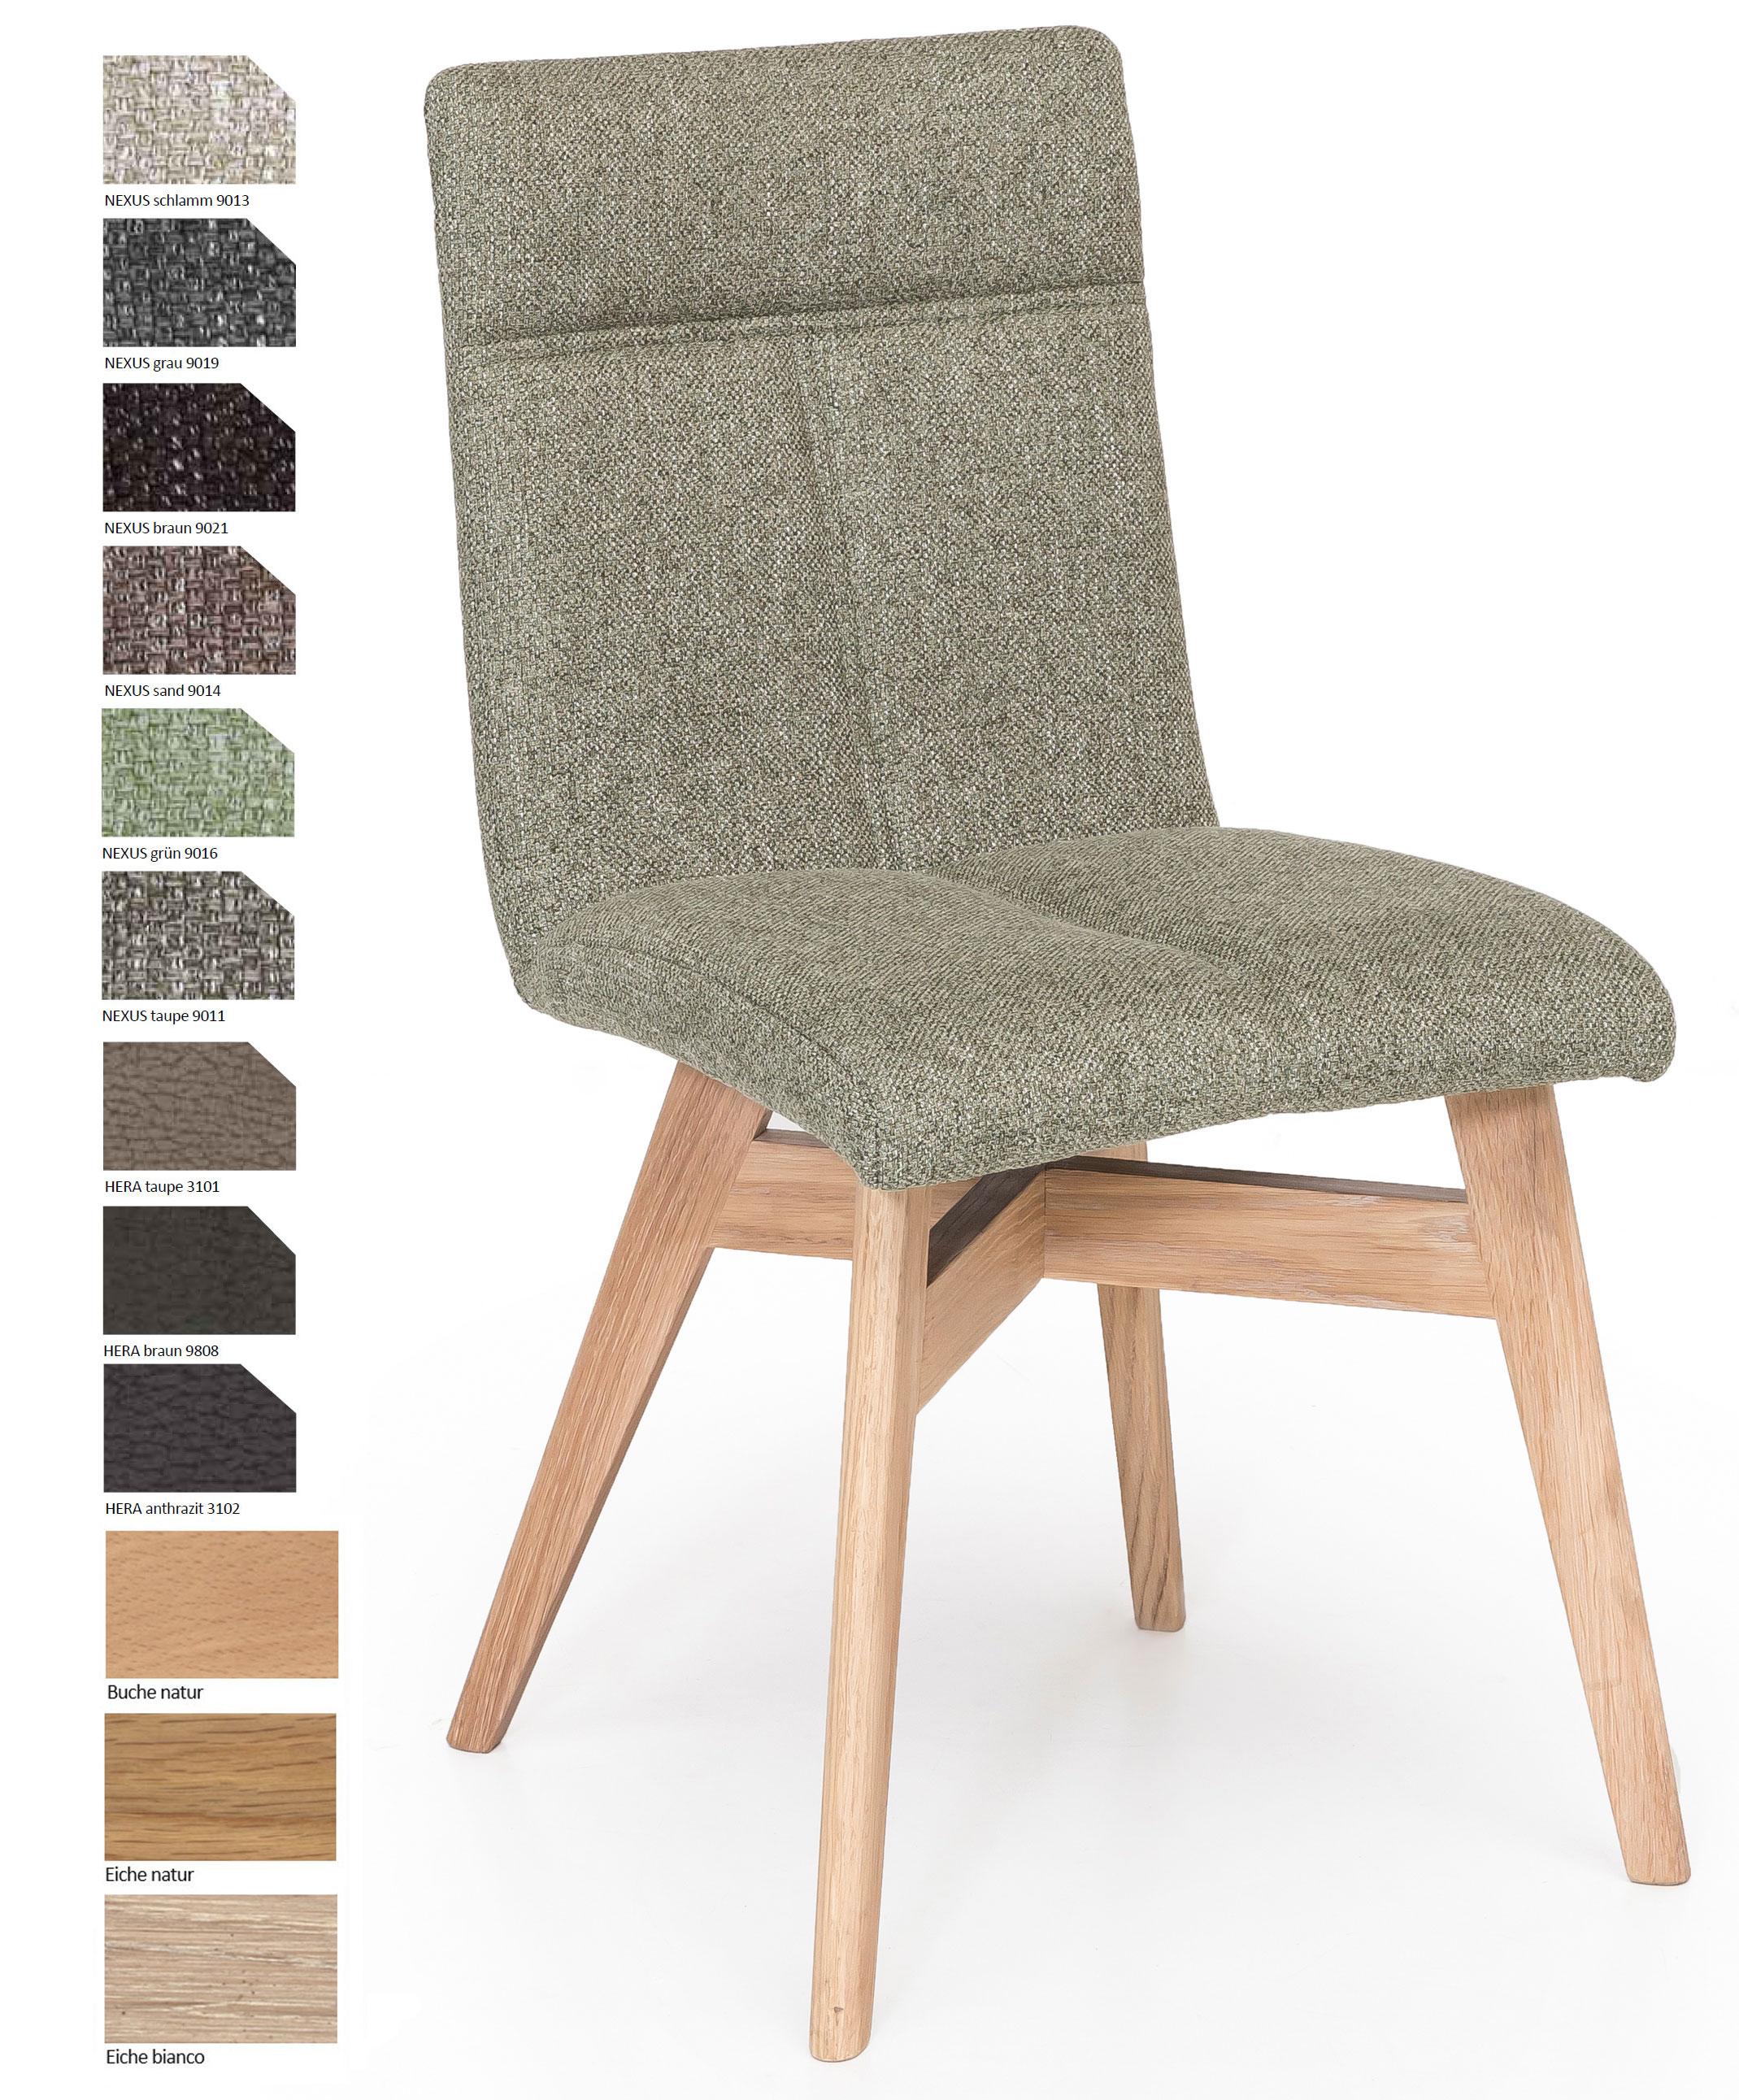 Standard Furniture Arona Polsterstuhl In Vielen Farben Mobelmeile24